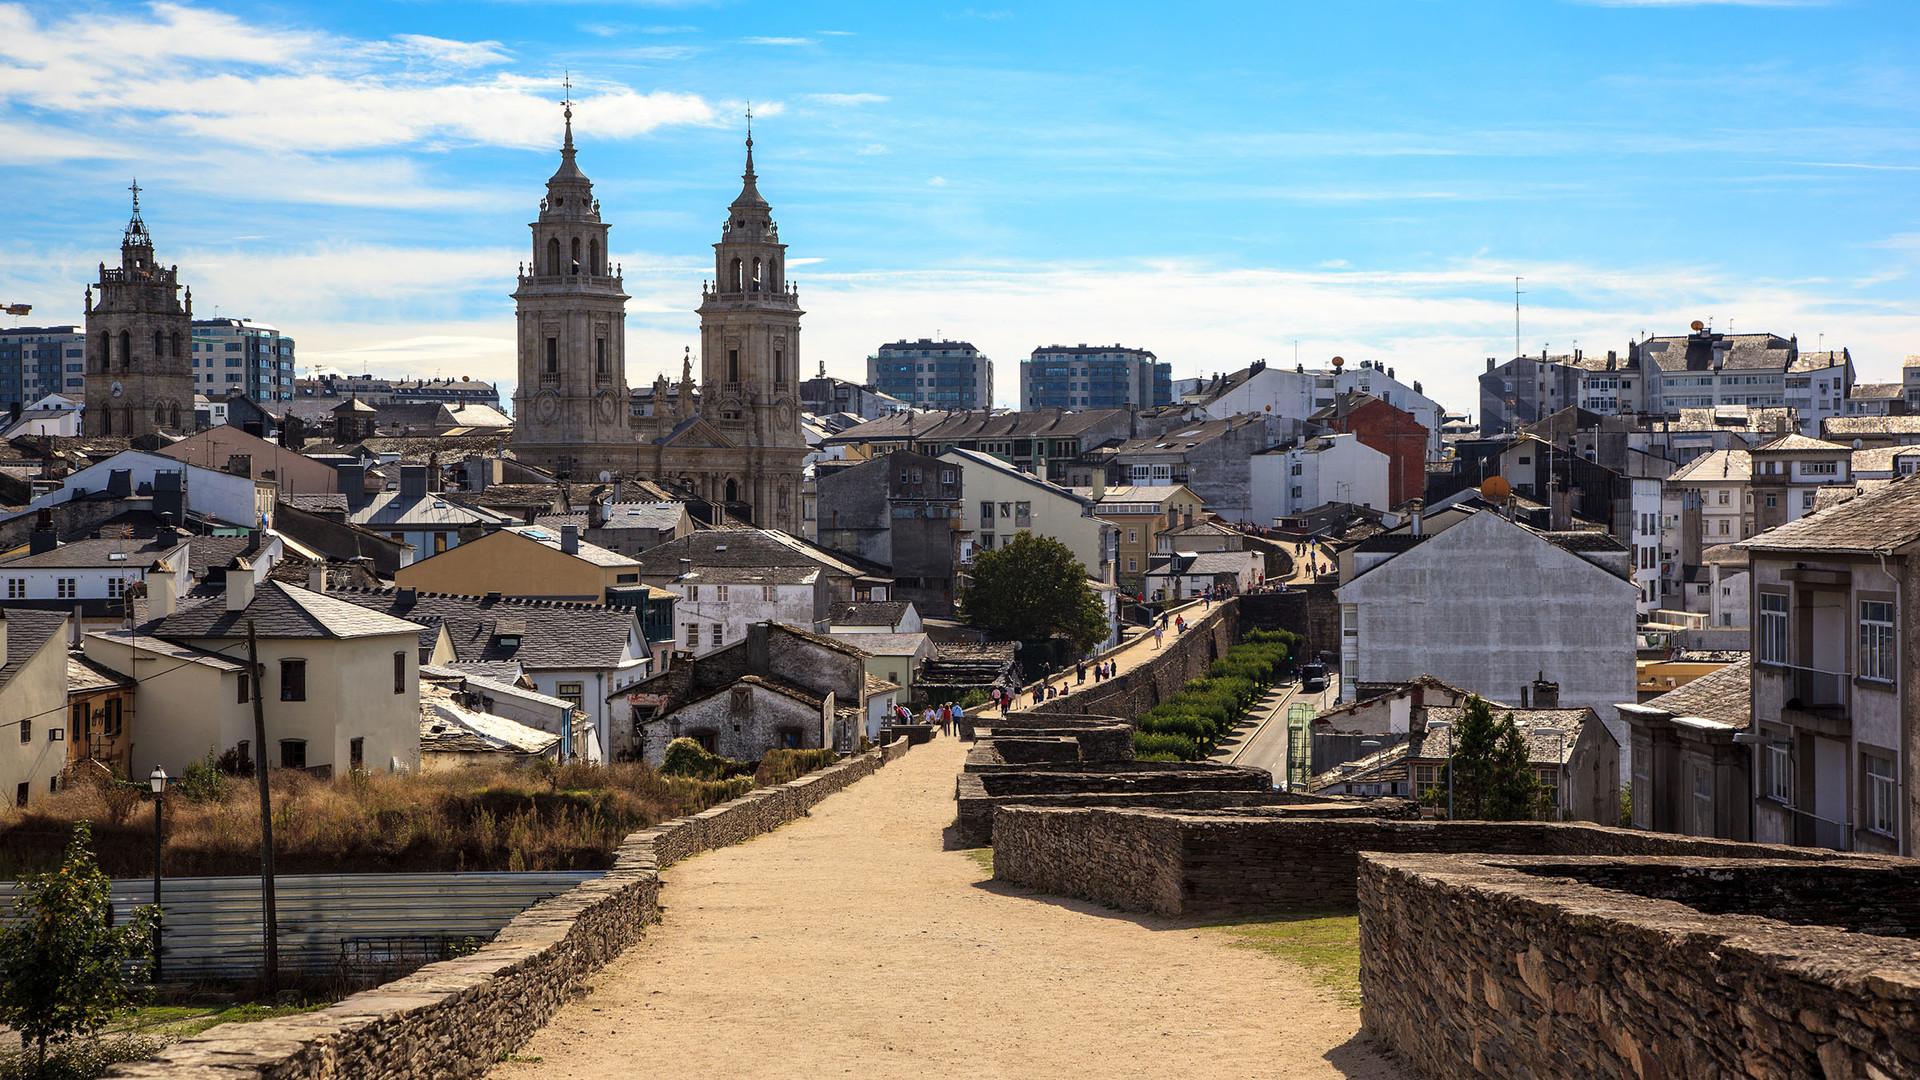 Cost U Less >> Nuria's experience in Lugo, Spain | Erasmus experience Lugo